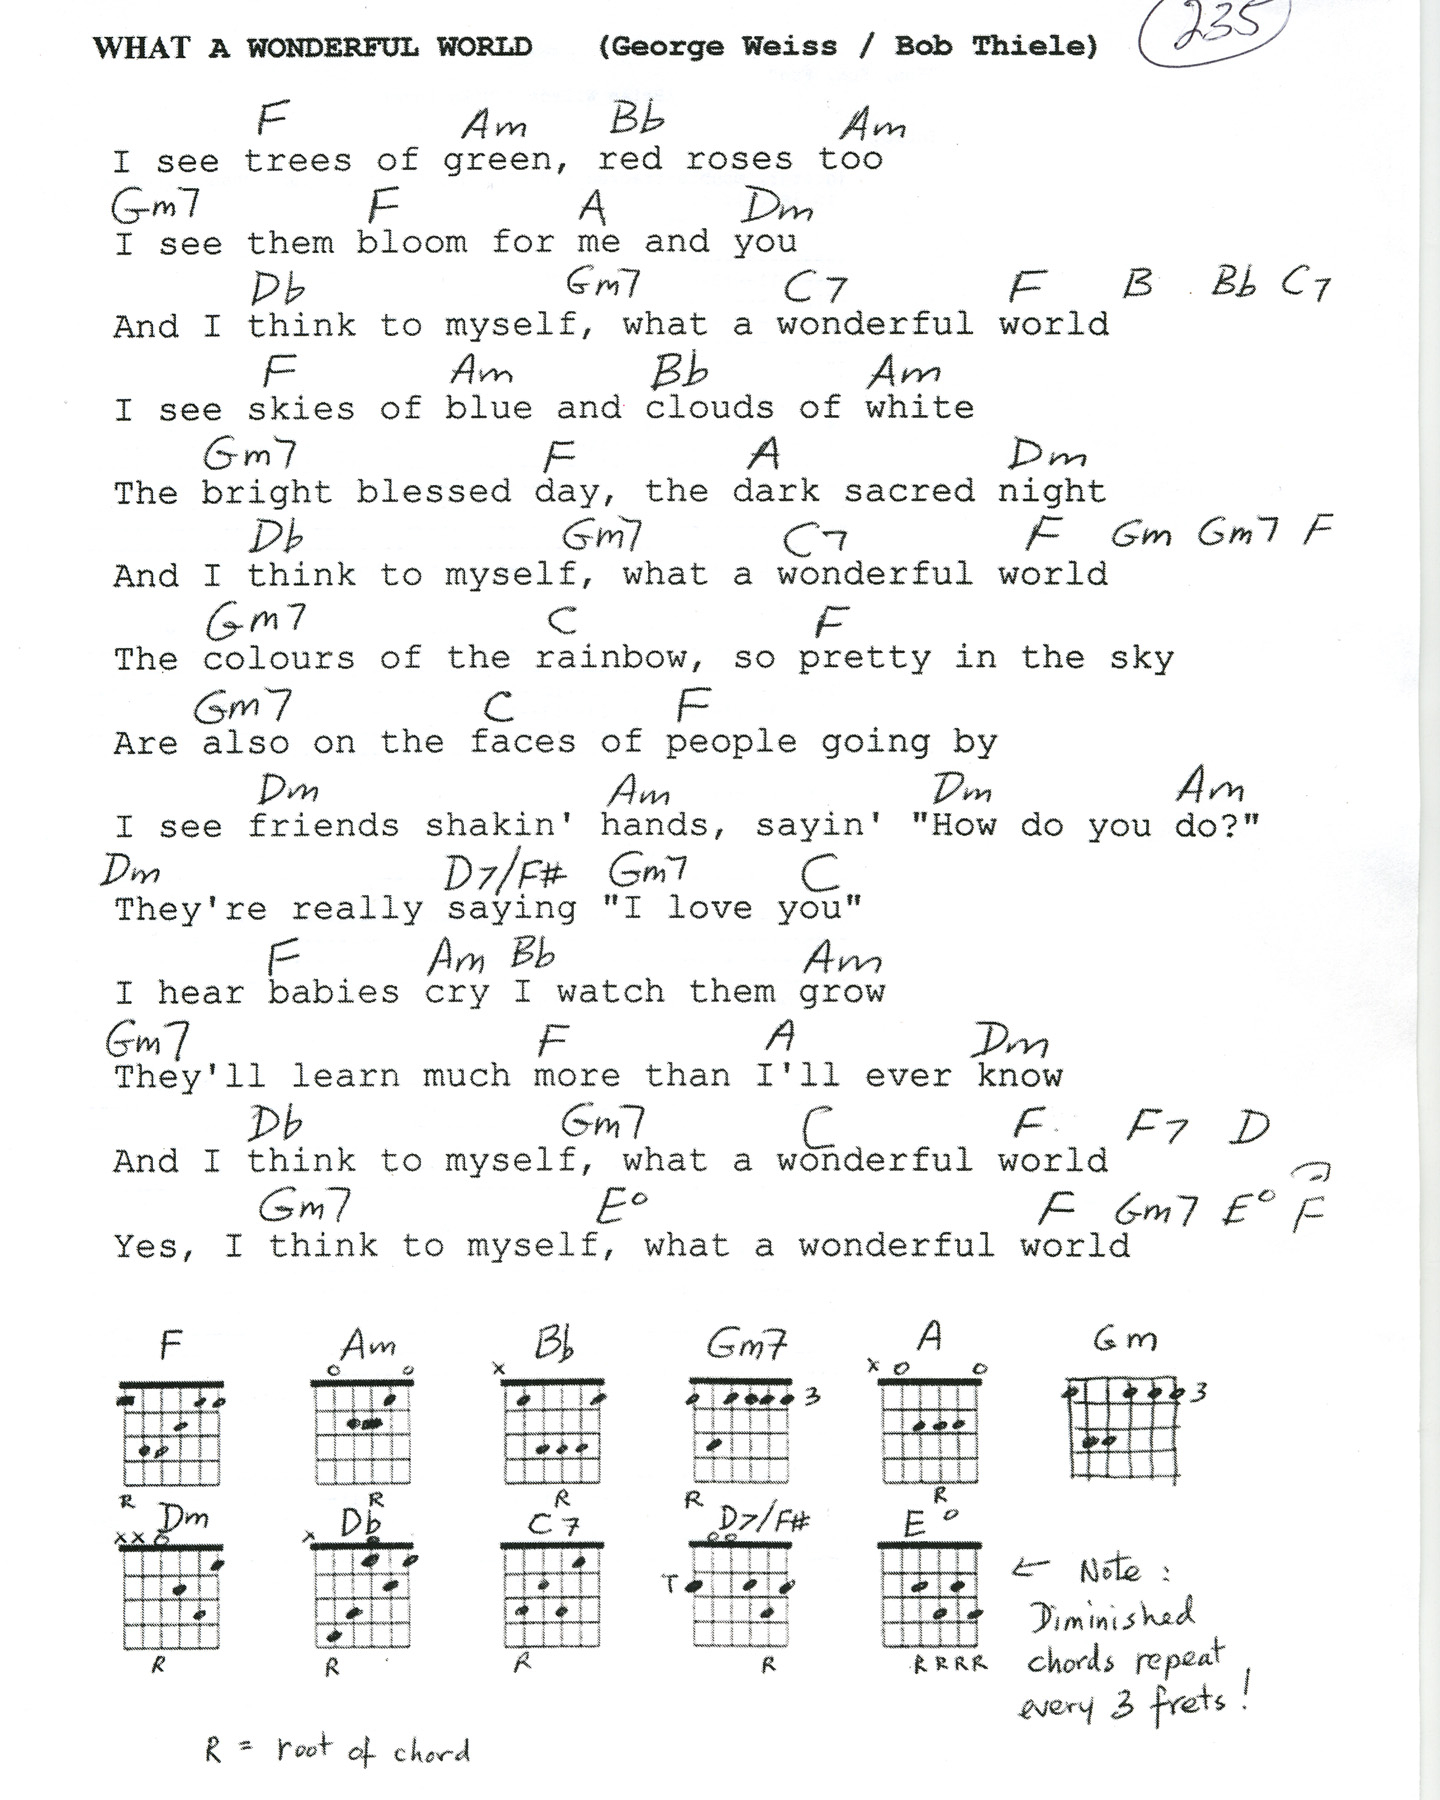 What A Wonderful World Chords What A Wonderful World Lyrics And Chords Mightyturk